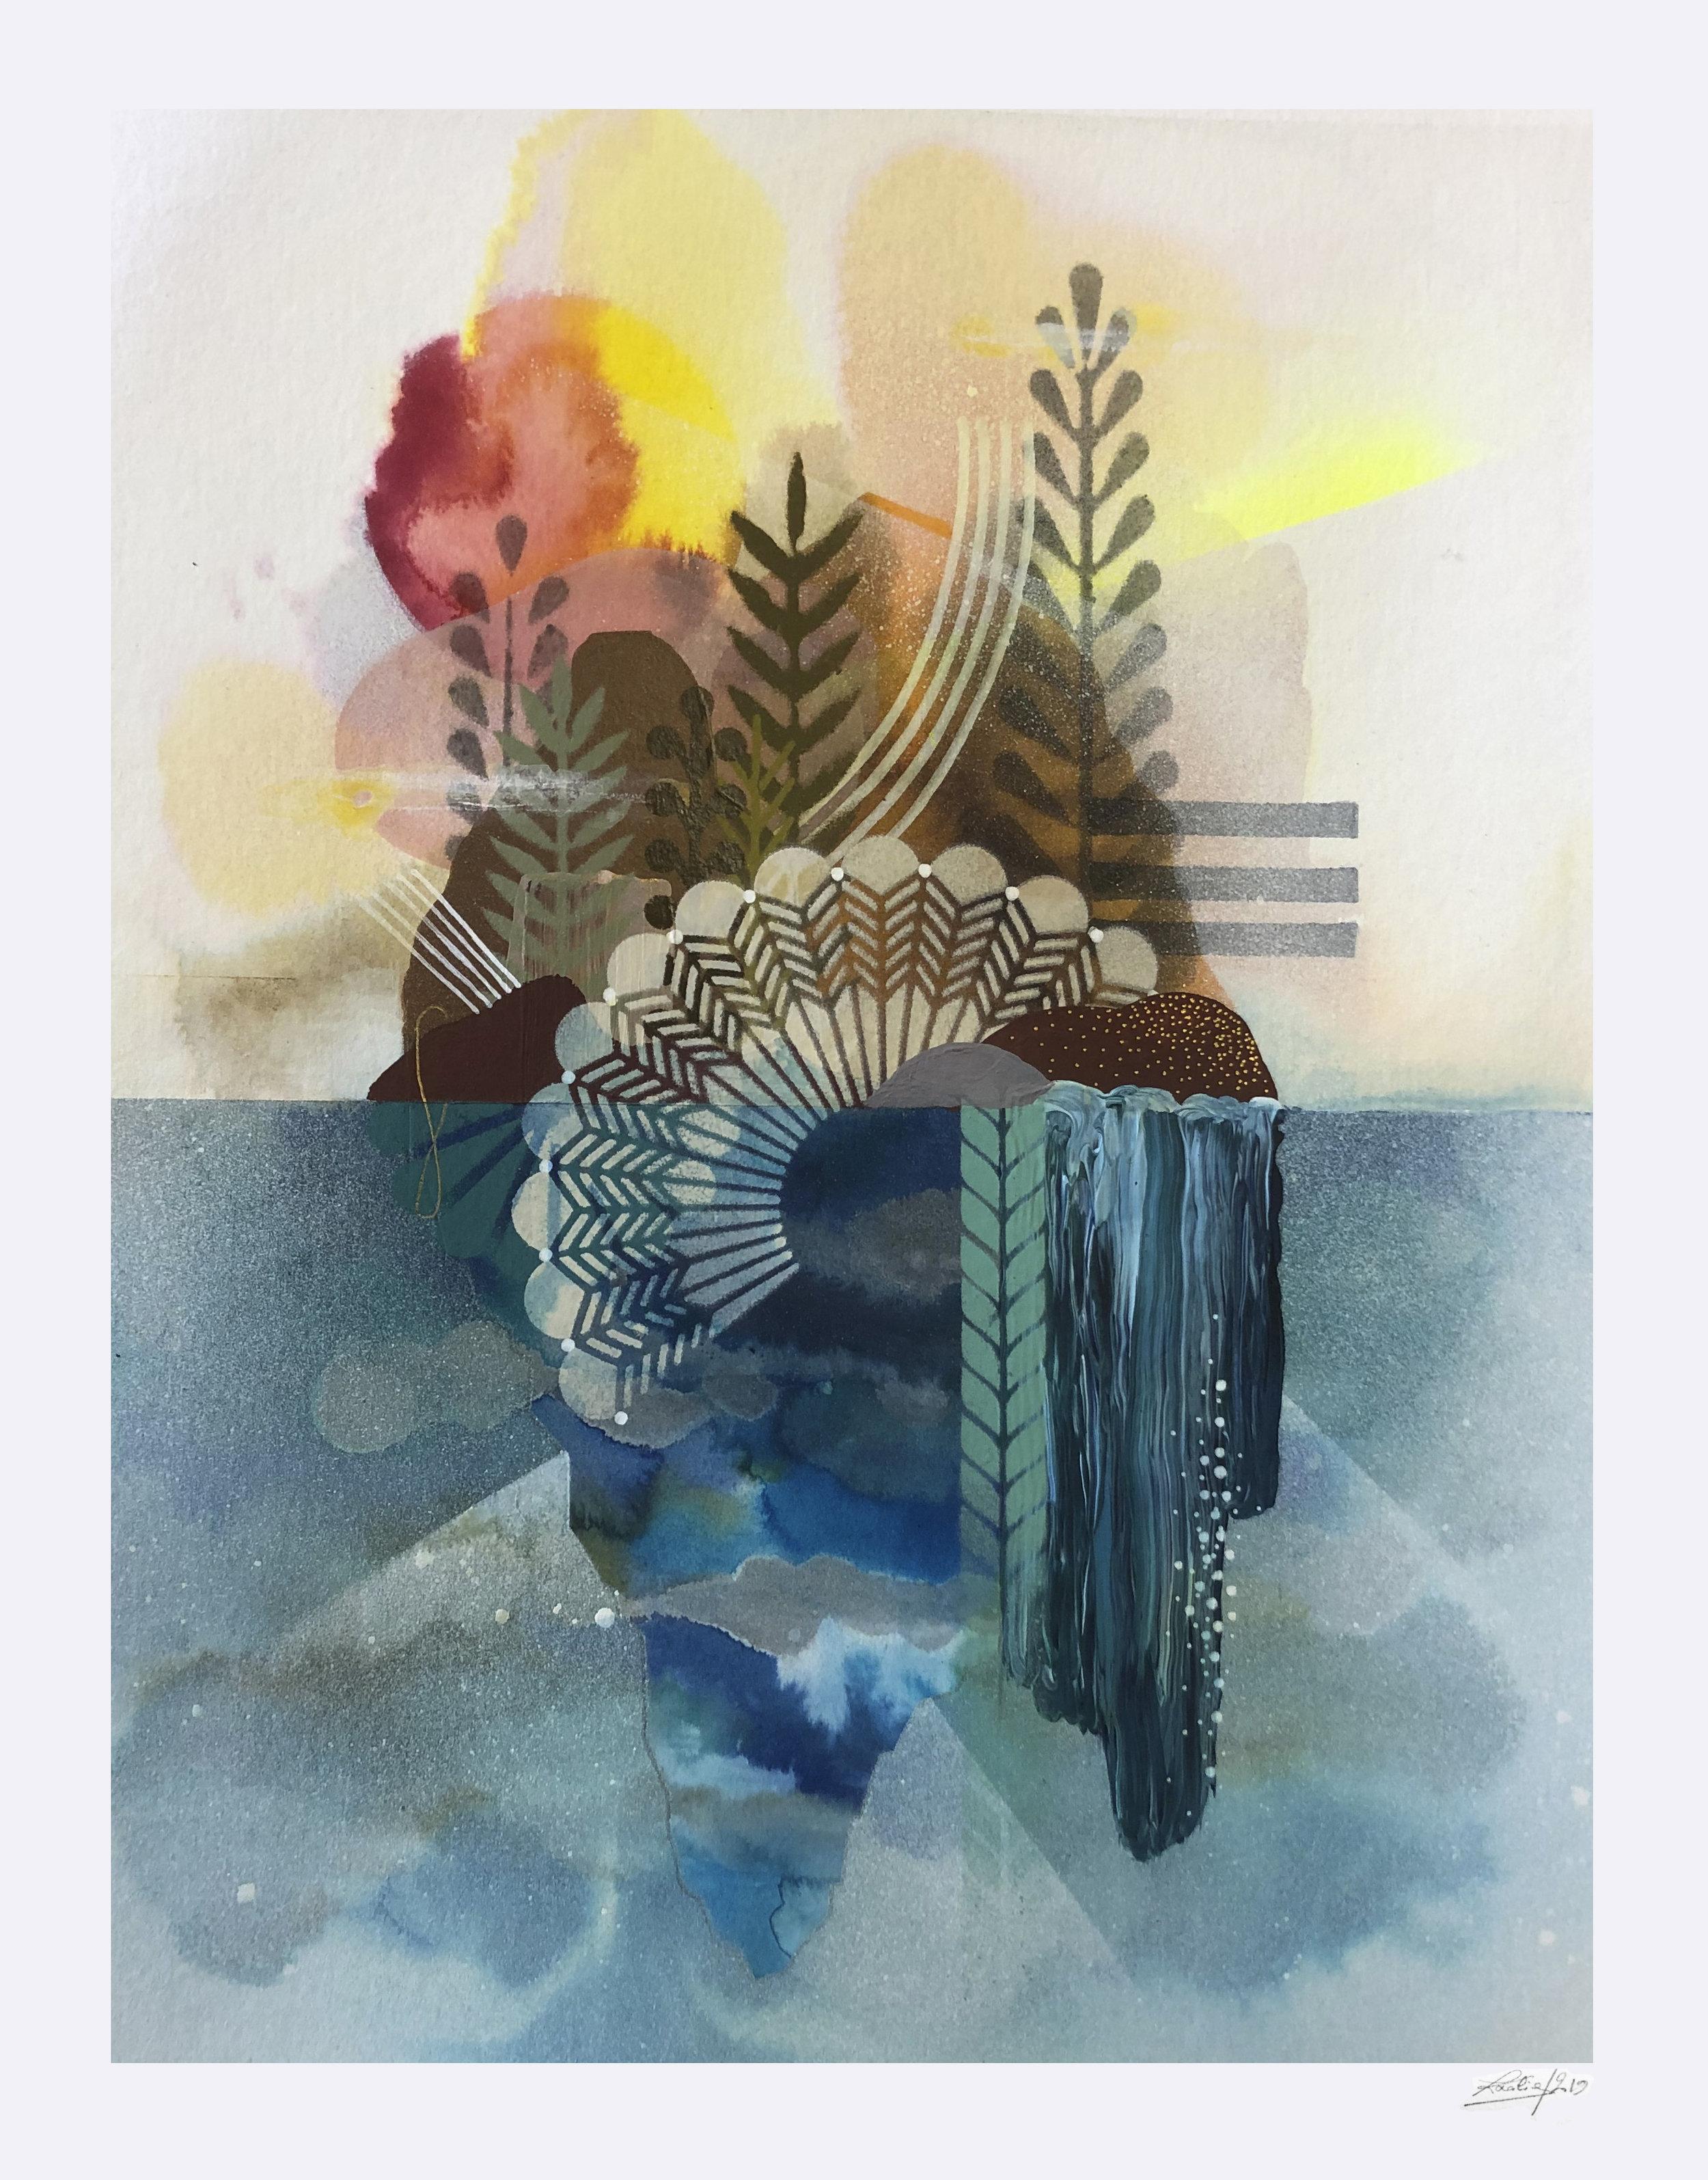 ardin Flottant #3  - Mix media on paper - 36 x46 cm | 2019